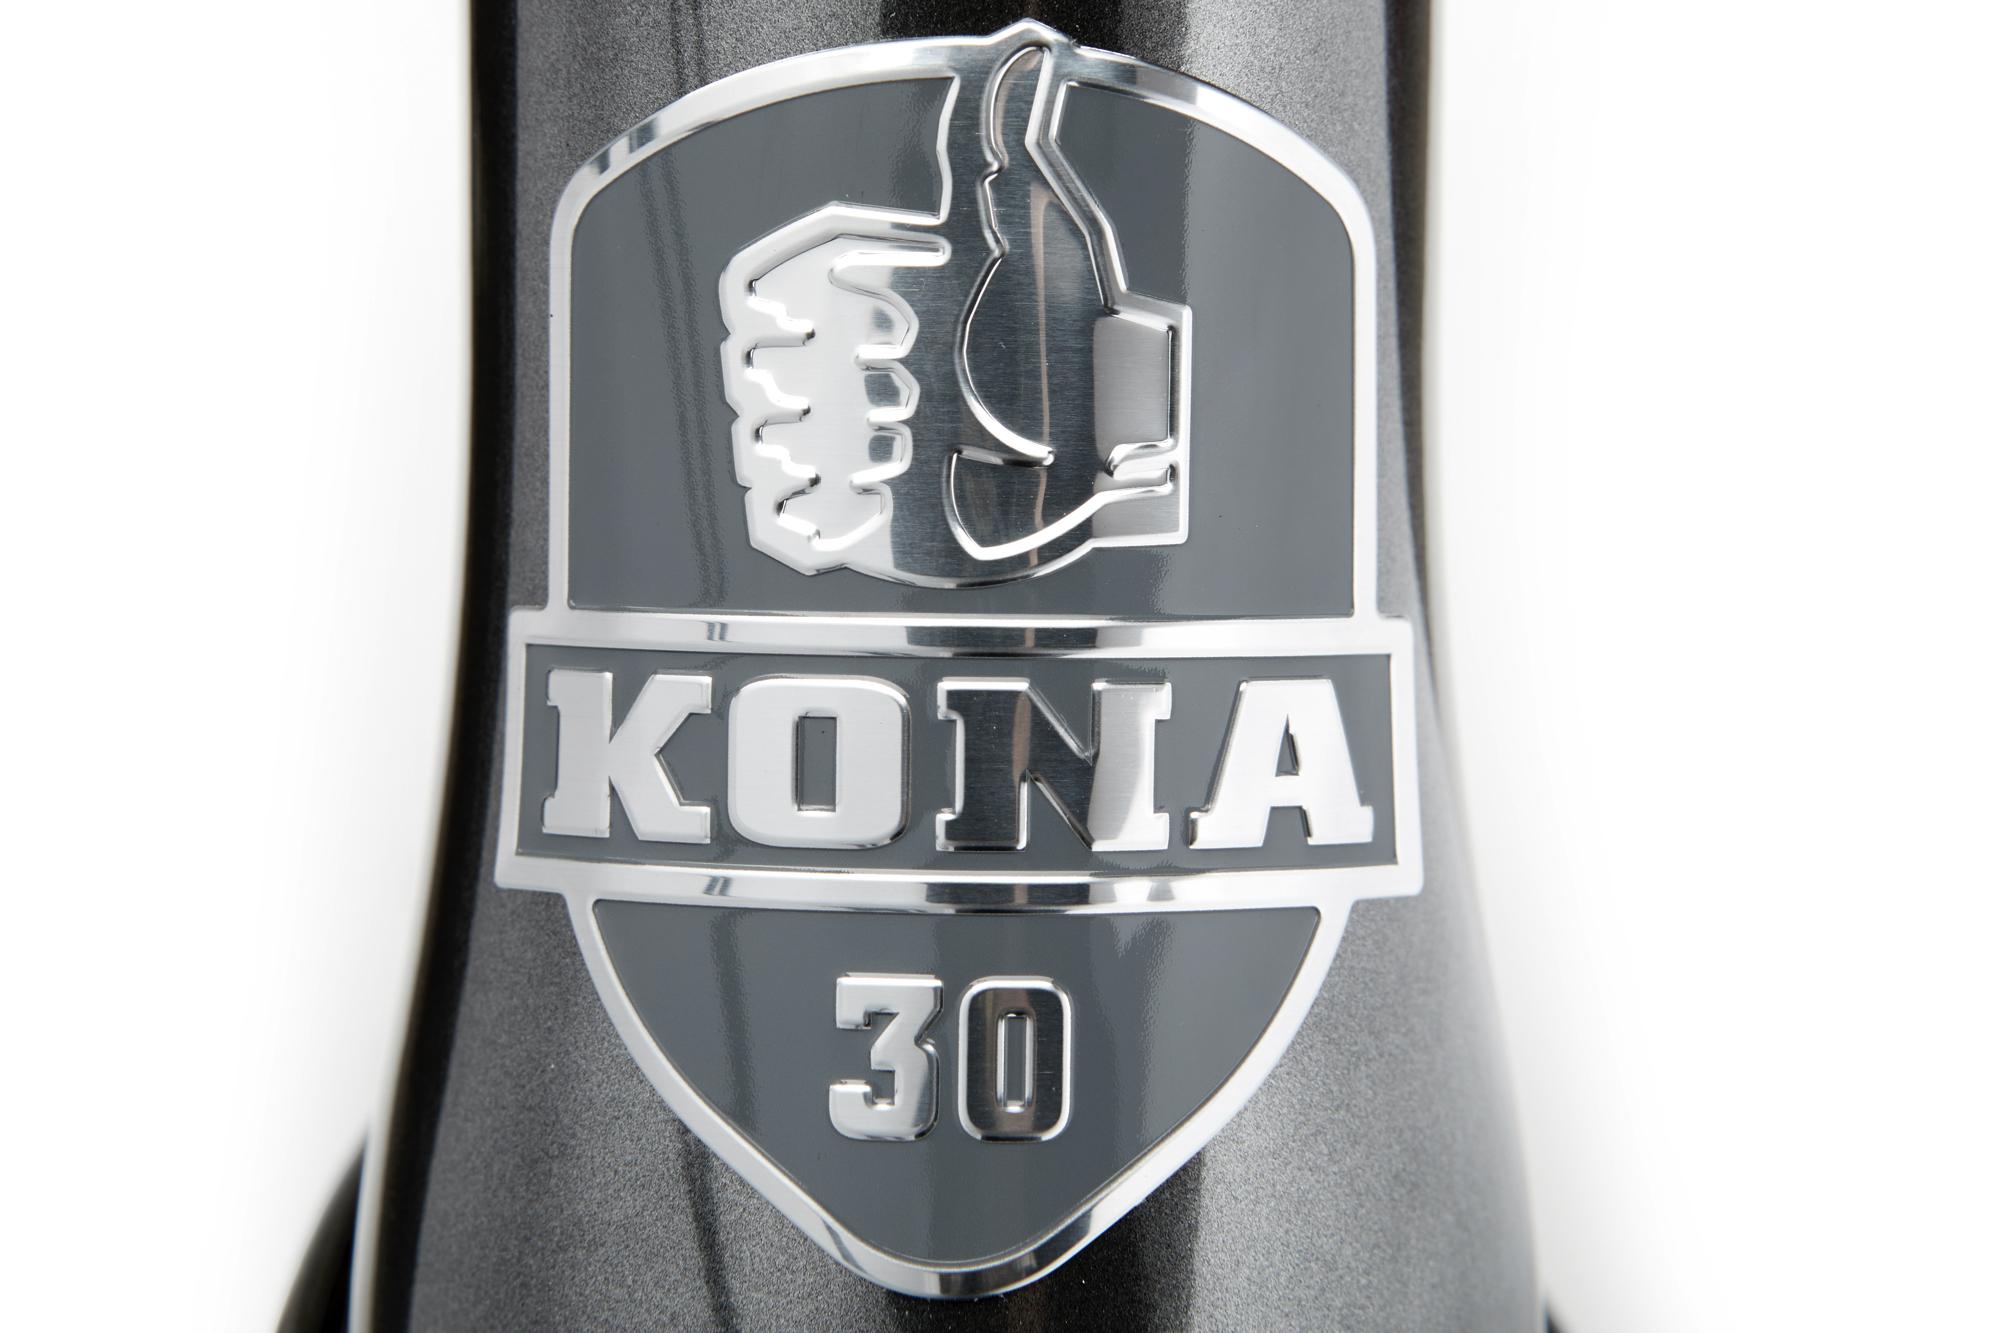 20180531-Kona_Details-Honzo_Birthday-1530_thumb.jpg